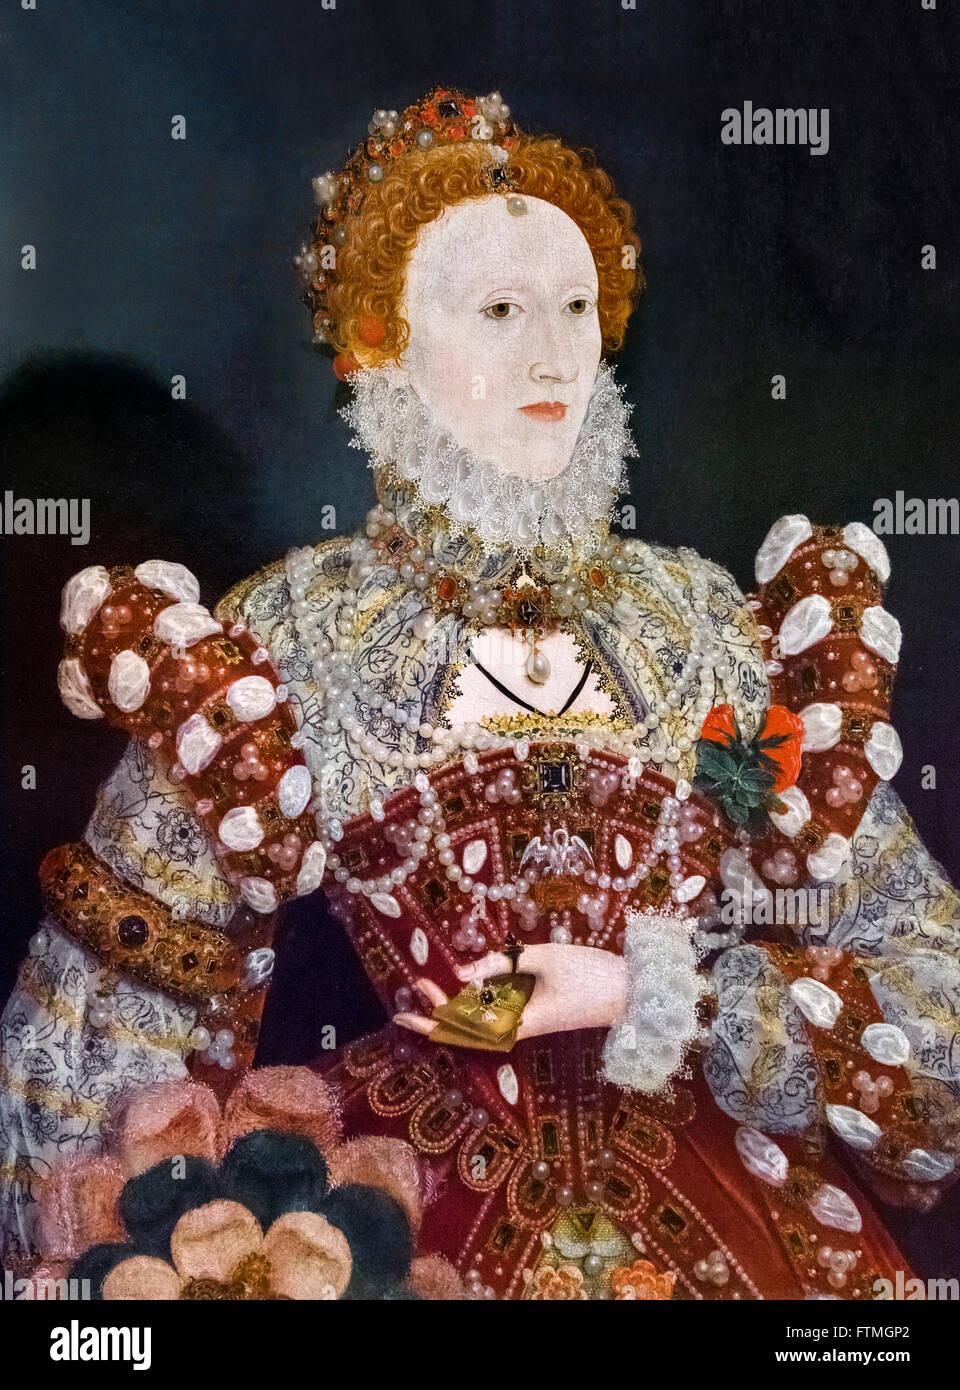 Elizabeth I. Portrait of Queen Elizabeth I by Nicholas Hilliard c 1573. - Stock Image